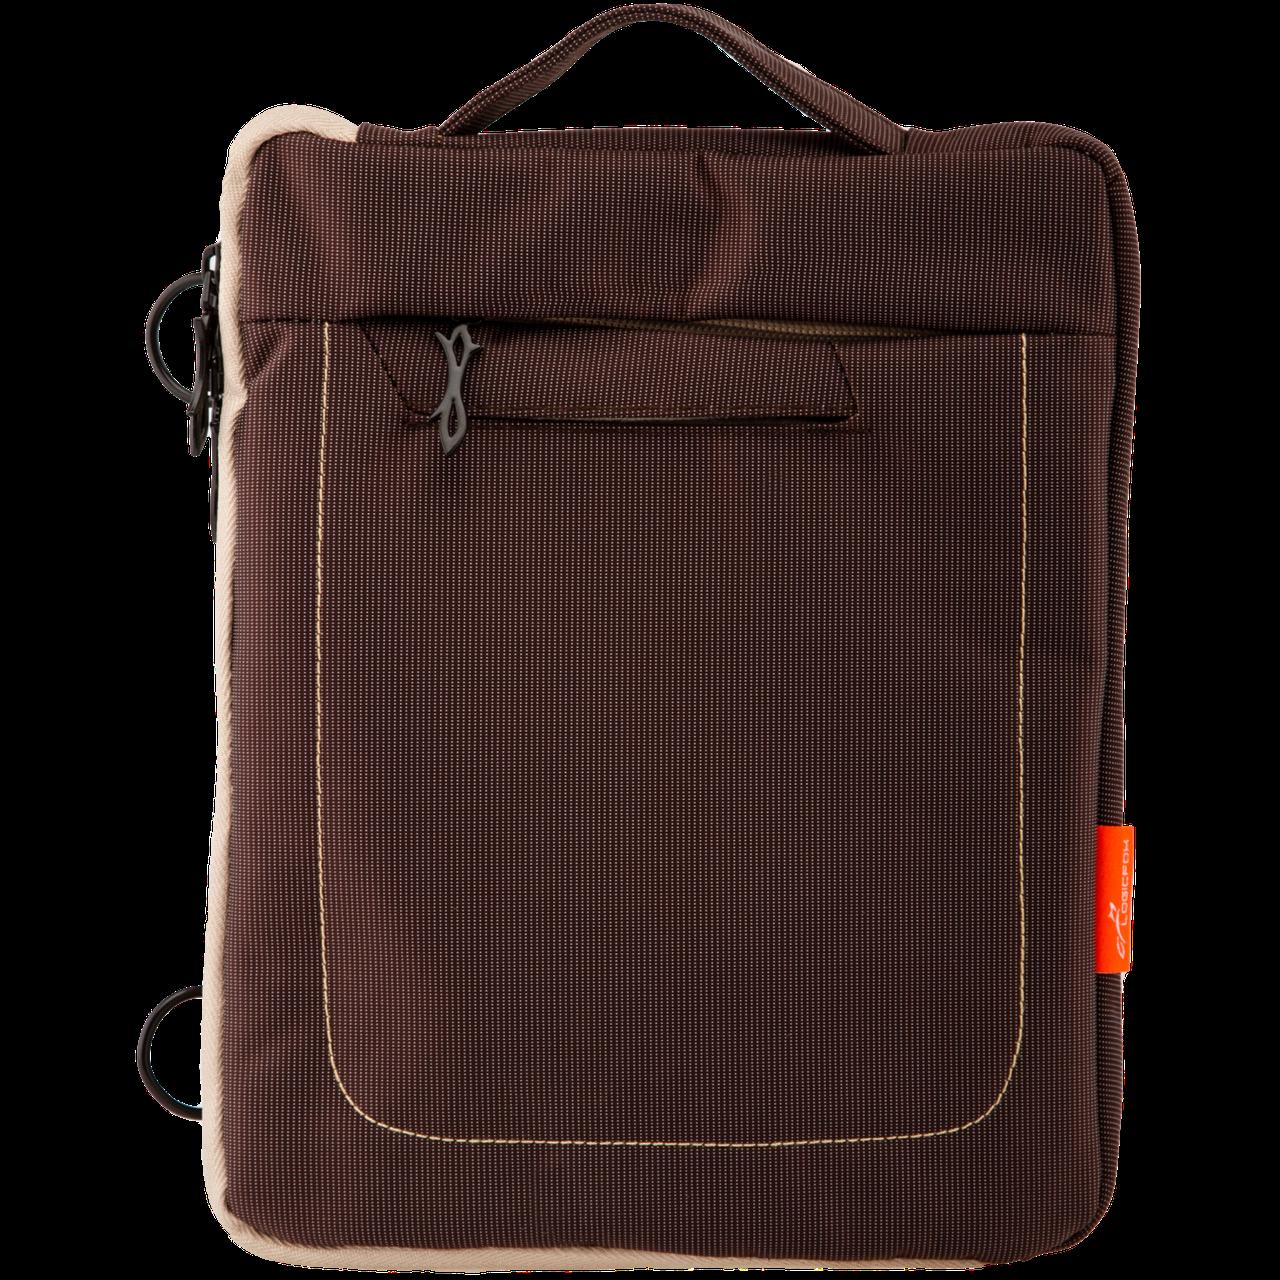 "9.7"" LF-016LG   Сумка для iPad, планшета, полиэстер, серо-коричневый"